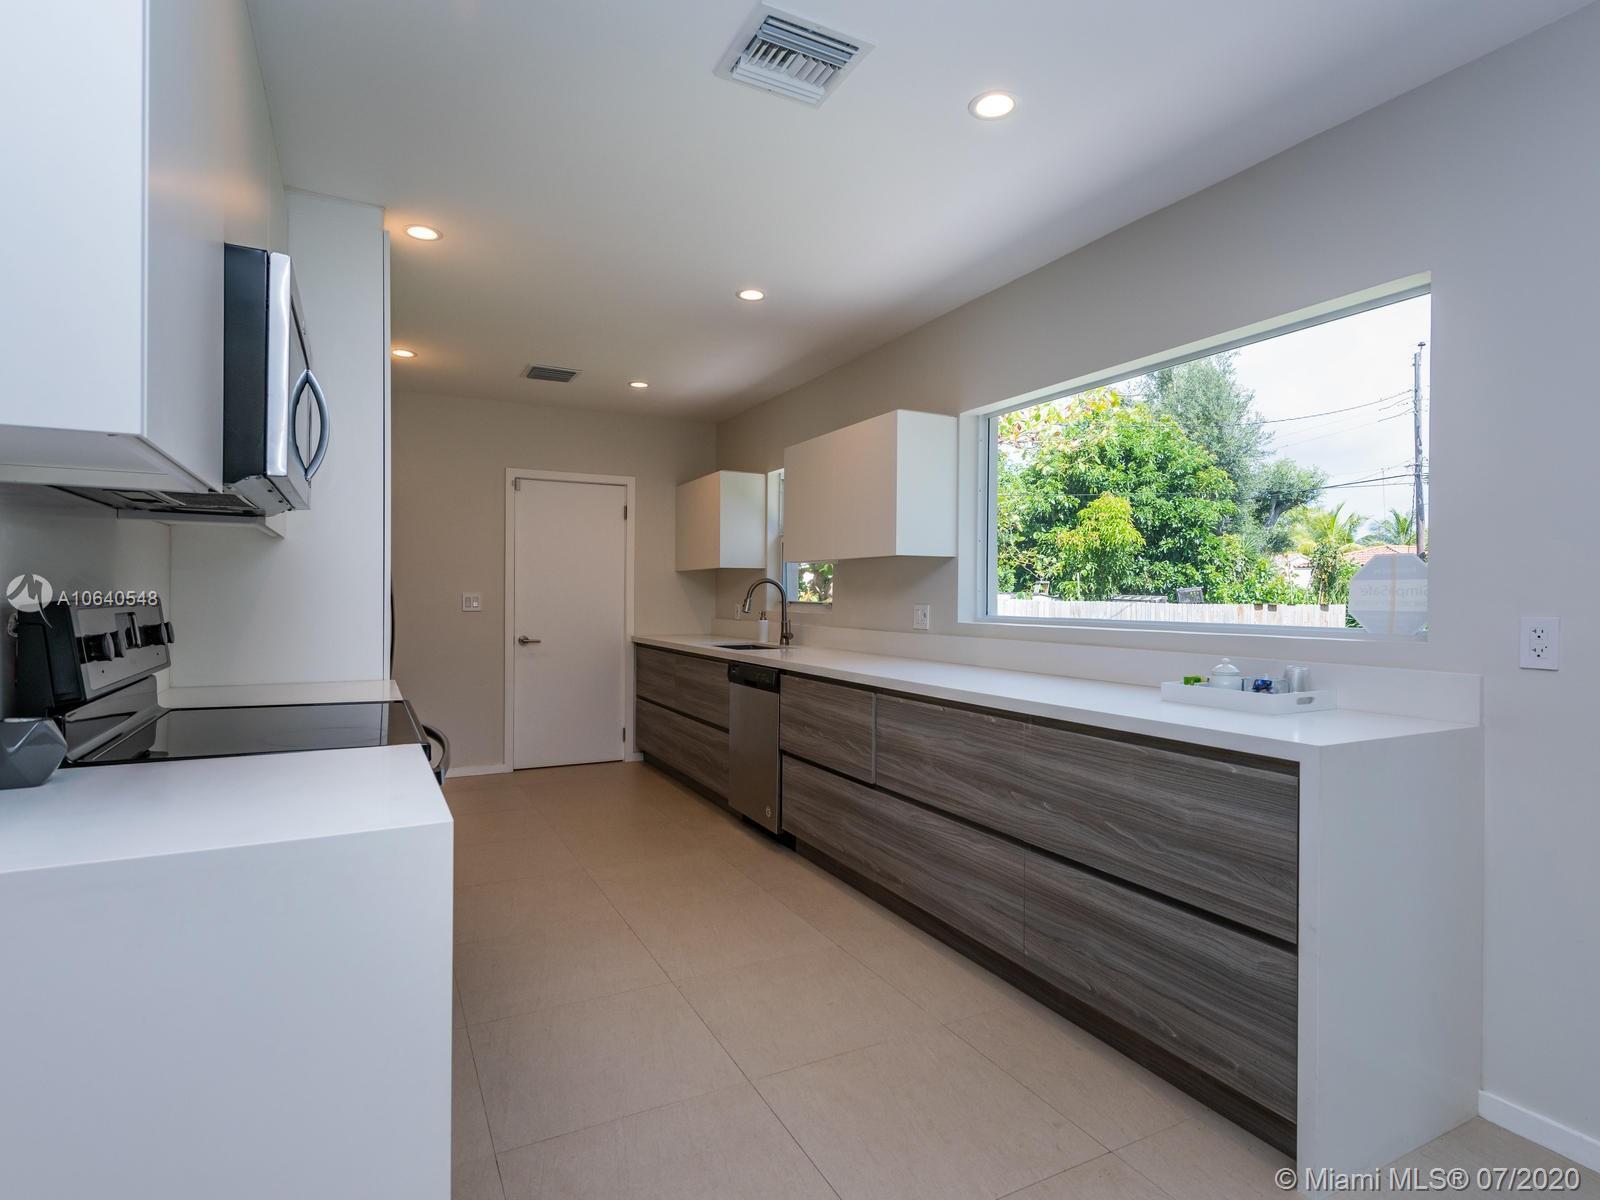 TOTALLY RENOVATED 3 bedroom home in prestigious Miami Shores Village. Brand new Impact Windows throu